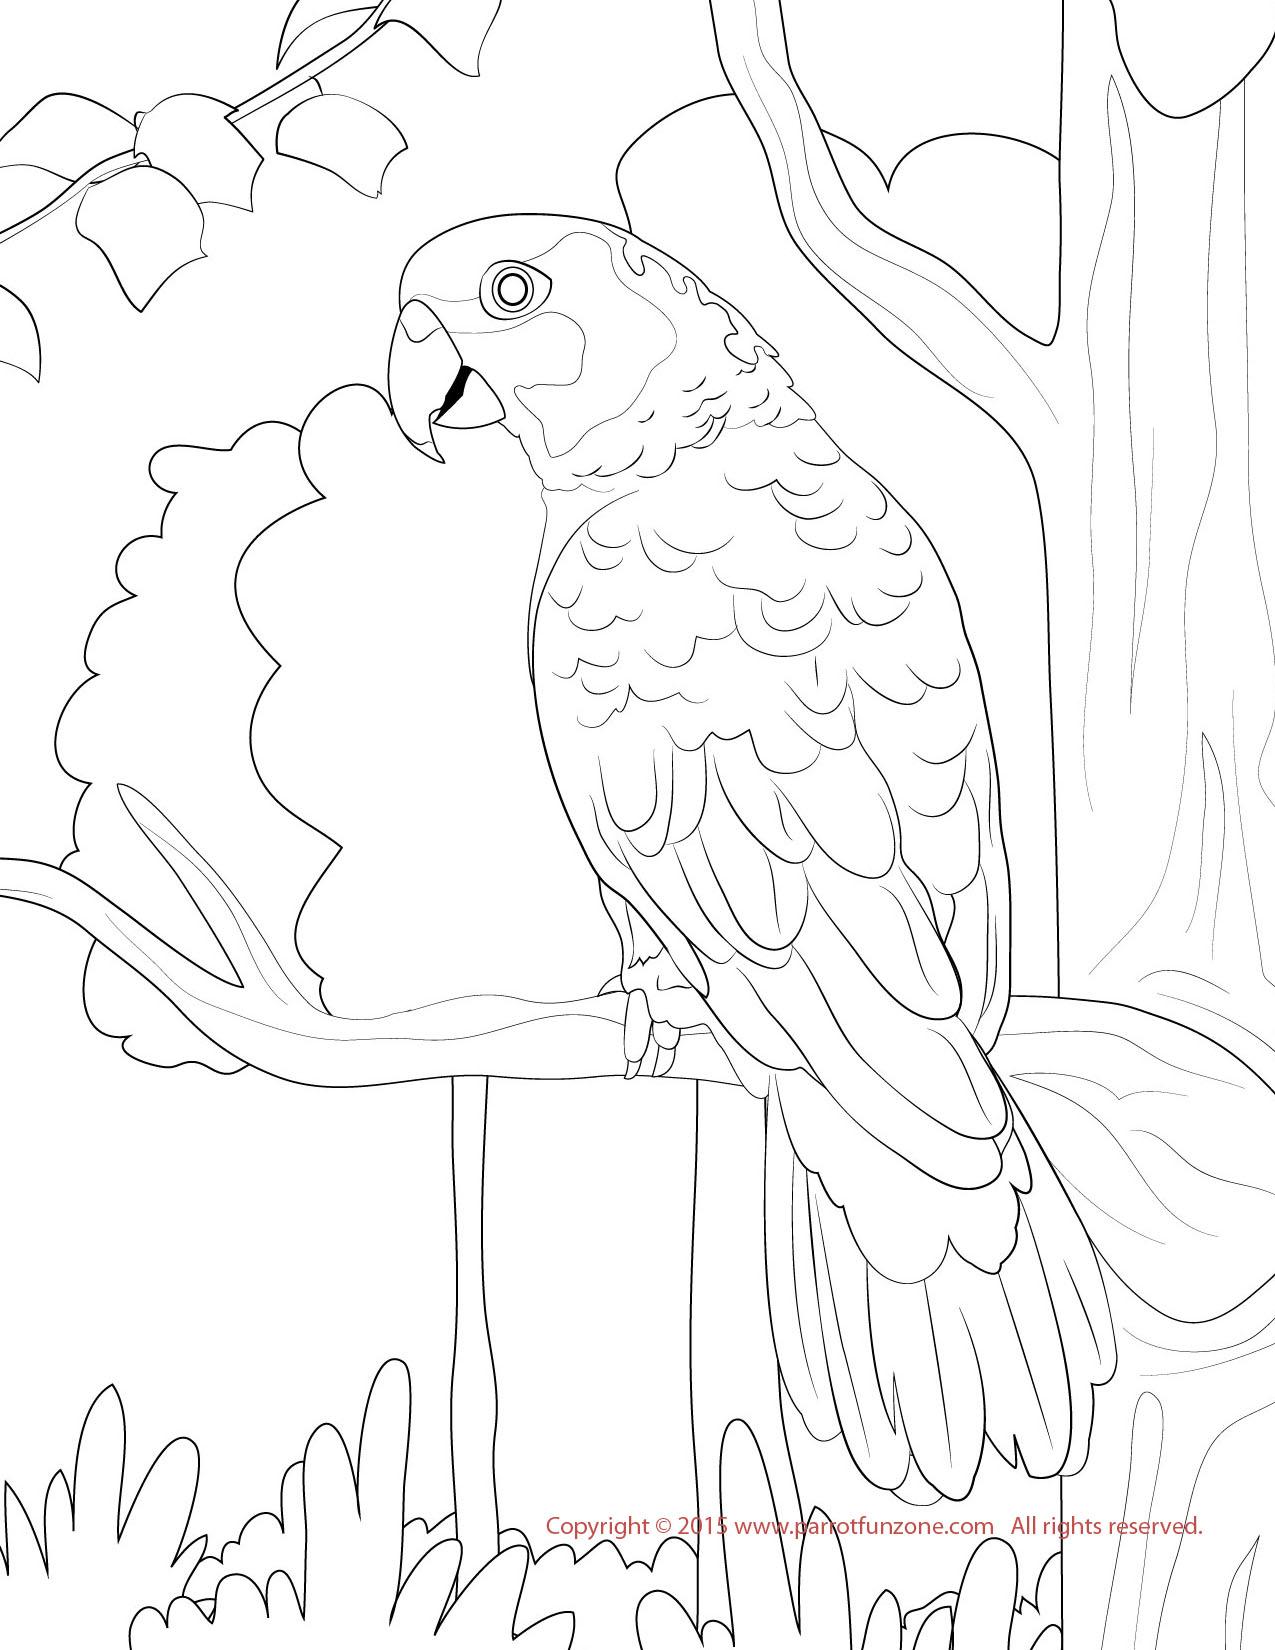 Conure coloring #6, Download drawings